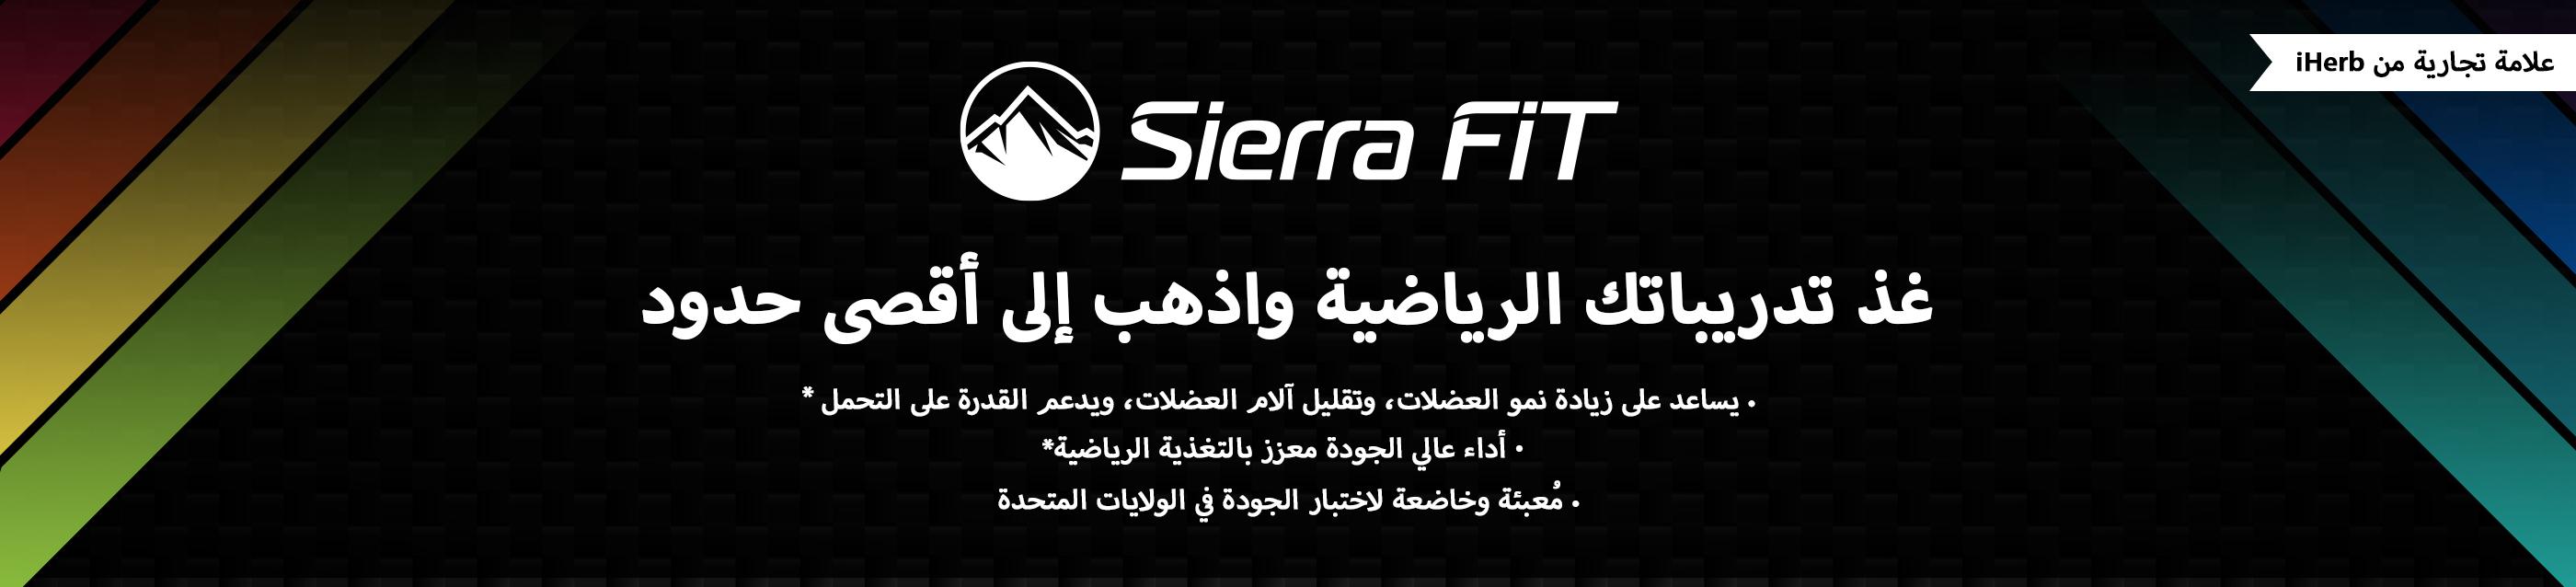 Sierra Fit